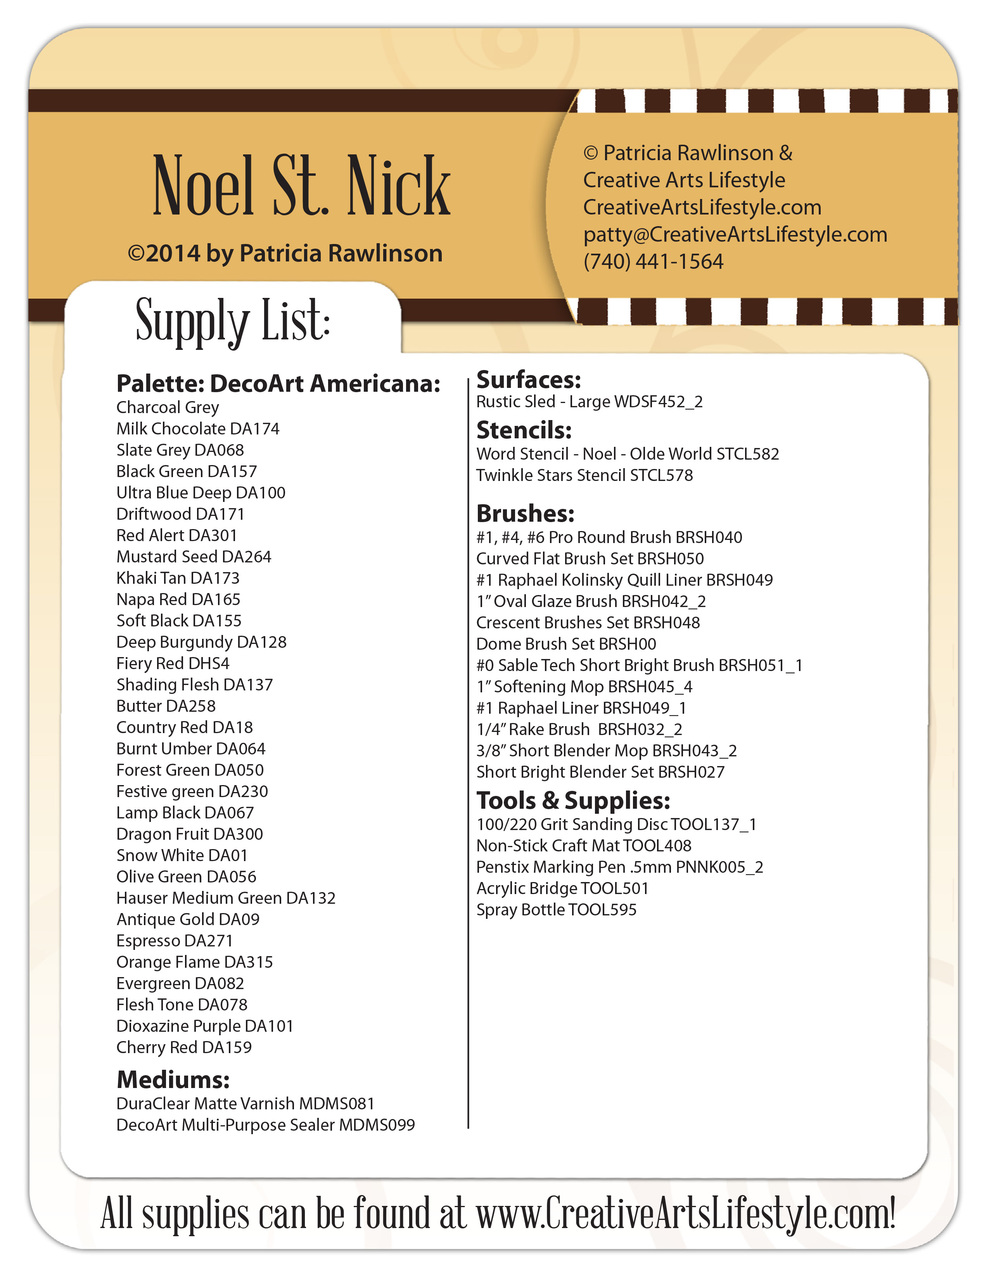 Noel Saint Nick E-packet - Patricia Rawlinson